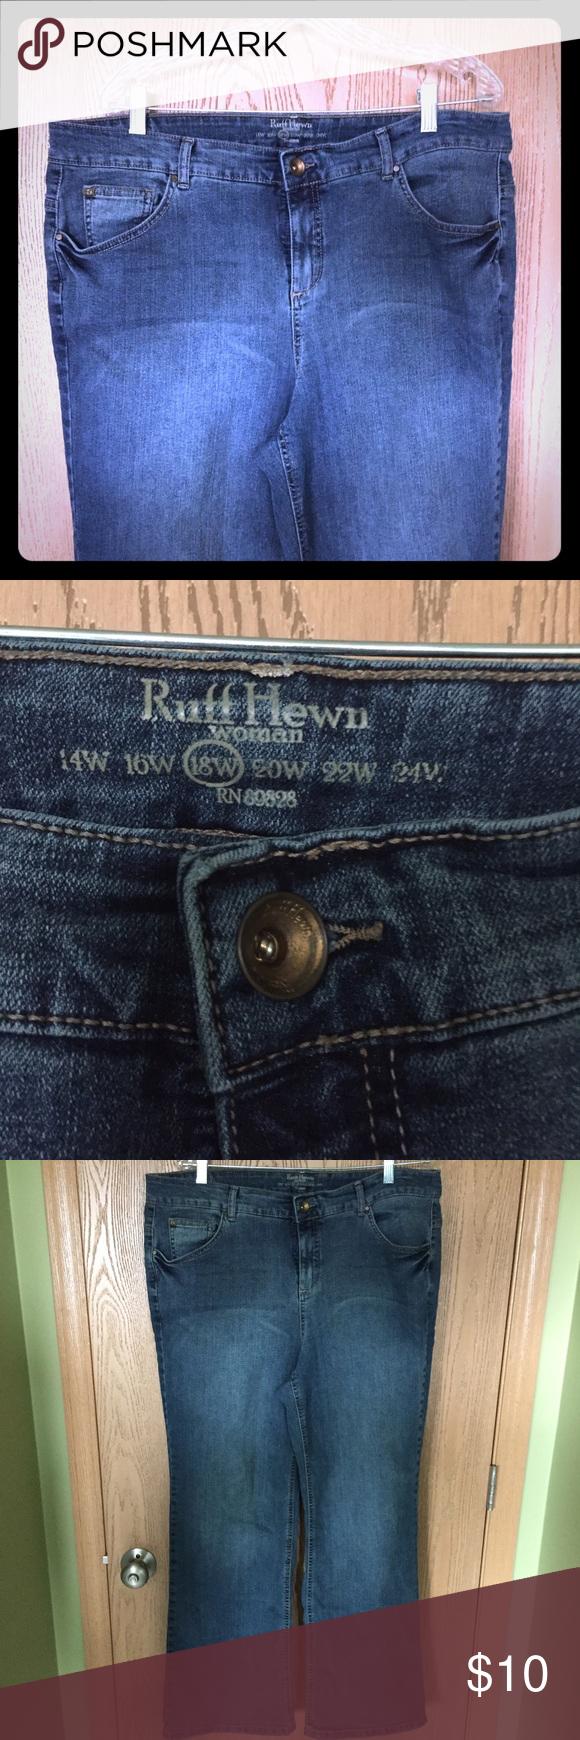 b1a49617a7c21 Ruff Hewn Plus Size Jean-Size 18 Plus Size Jean. Carsons brand. Good  condition still! Boot cut. Ruff Hewn Jeans Boot Cut